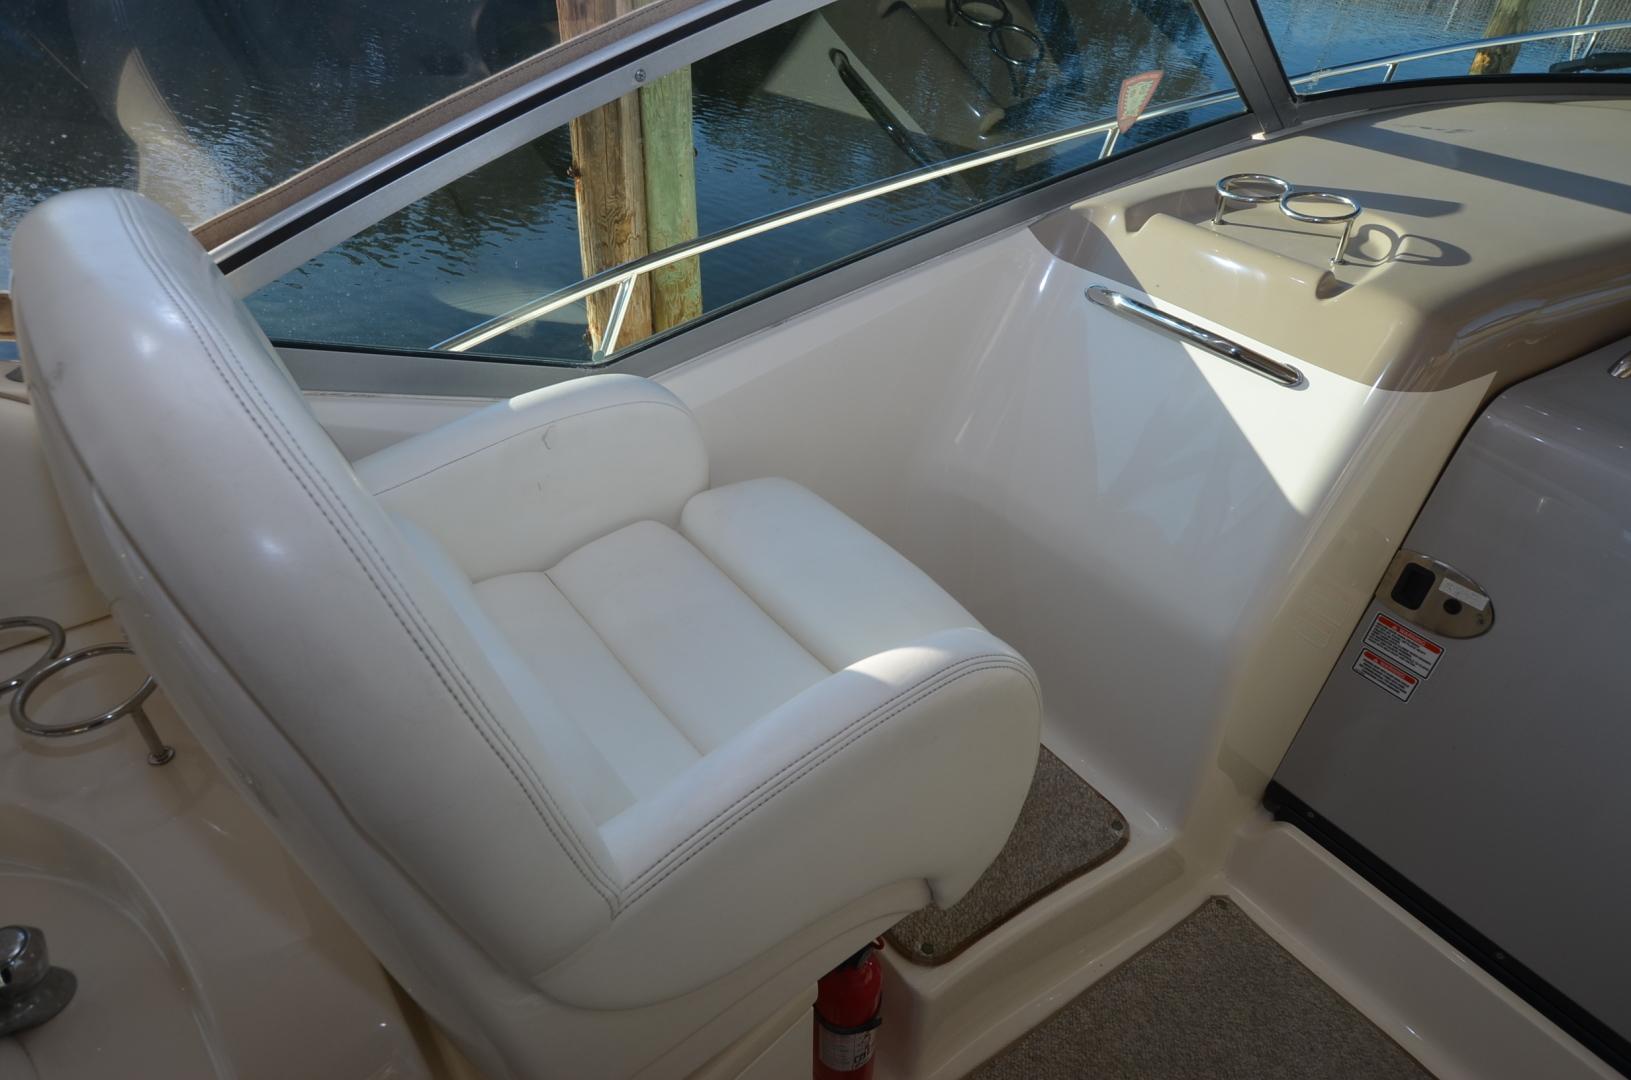 Sea Ray-340 Sundancer 2005-Better Place Palm Harbor-Florida-United States-1562809 | Thumbnail